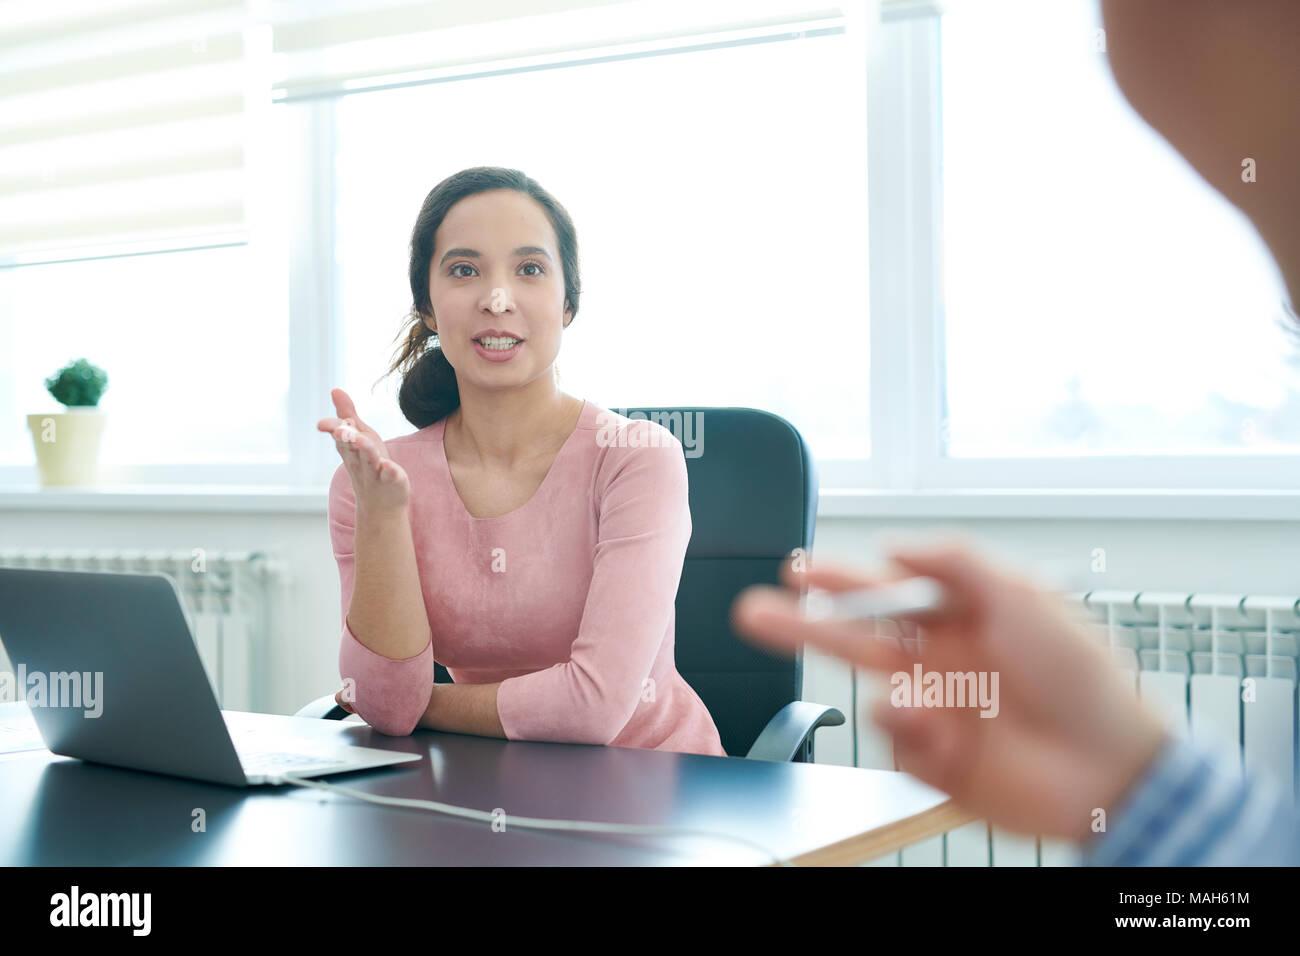 Enthusiastisch business lady diskutieren Agenda mit Kollegen Stockbild